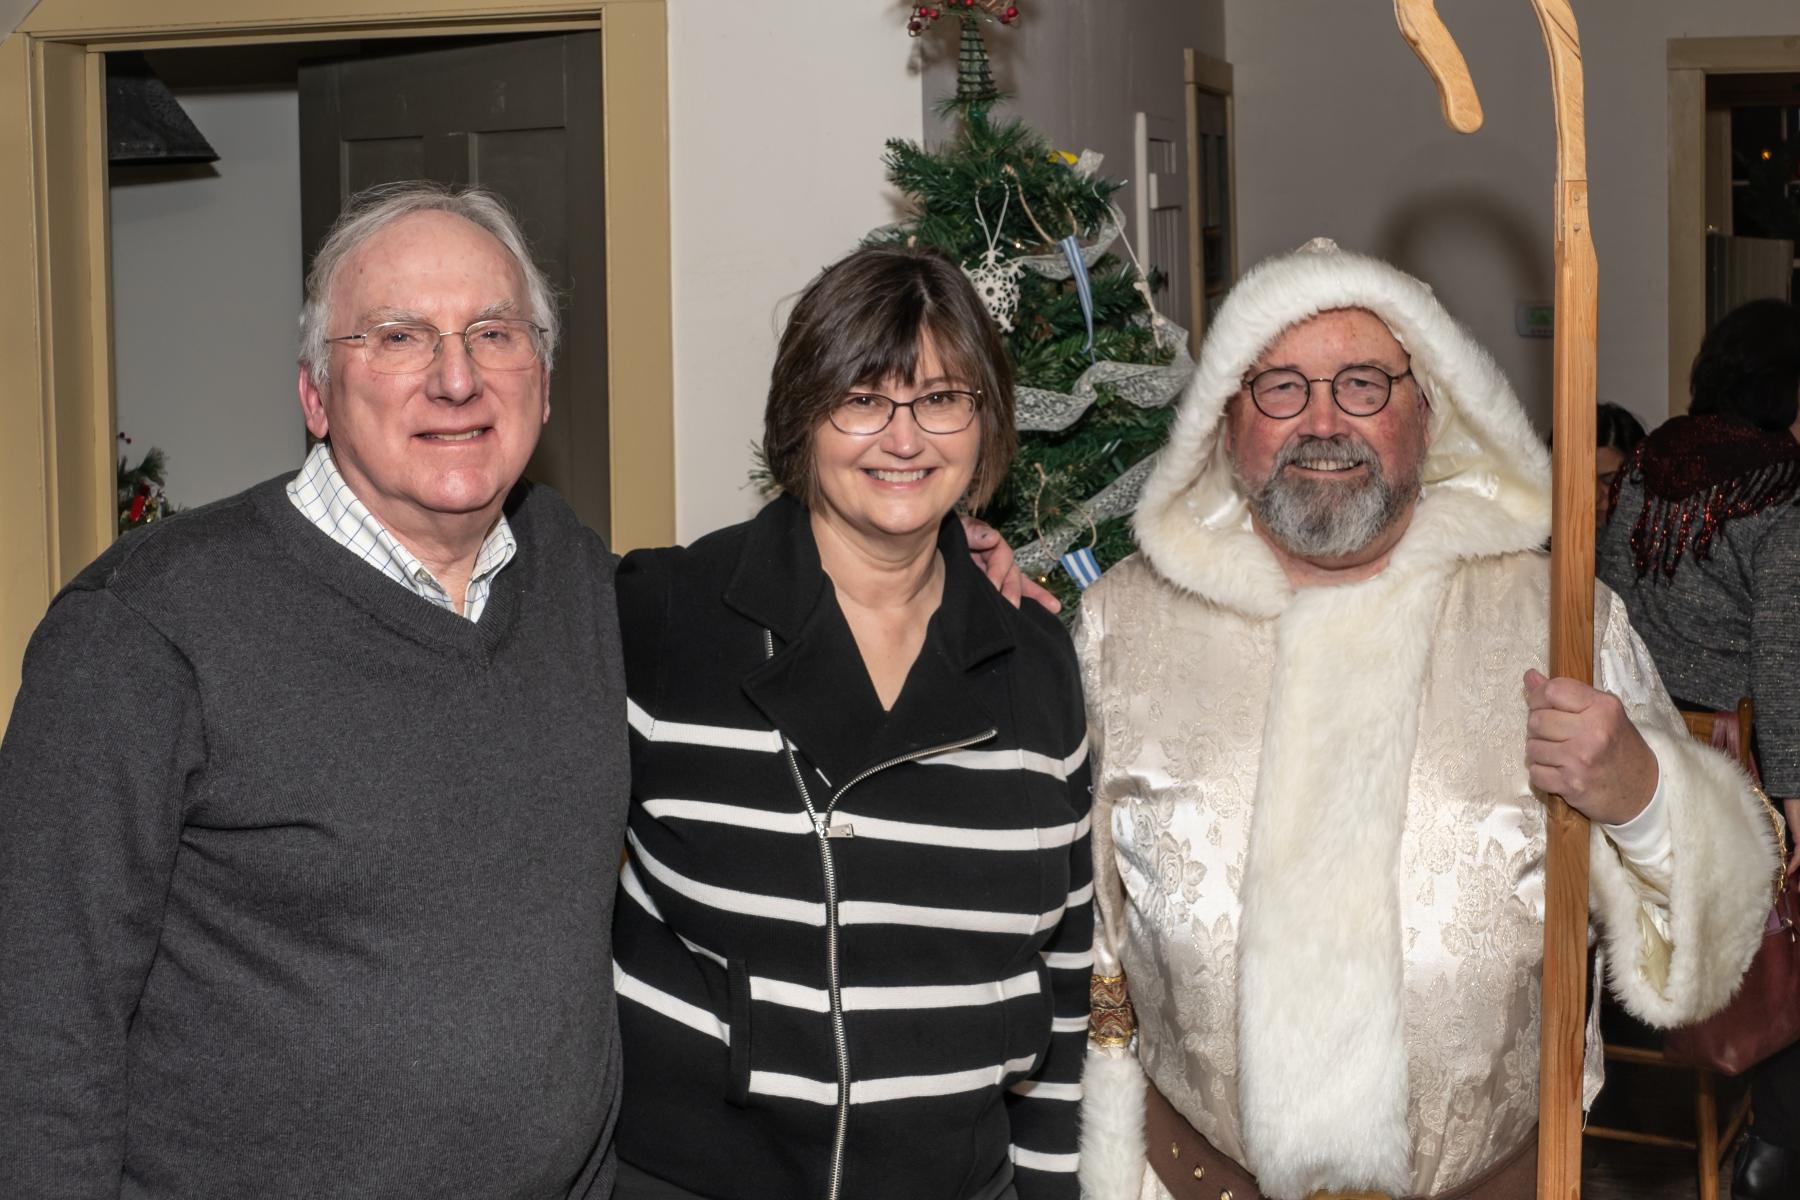 Gary & Ruth Rickard, Robert Sochacki, AAUW Xmas Party, Cady Inn, Mill Race Village, Northville, MI, Dec-2018